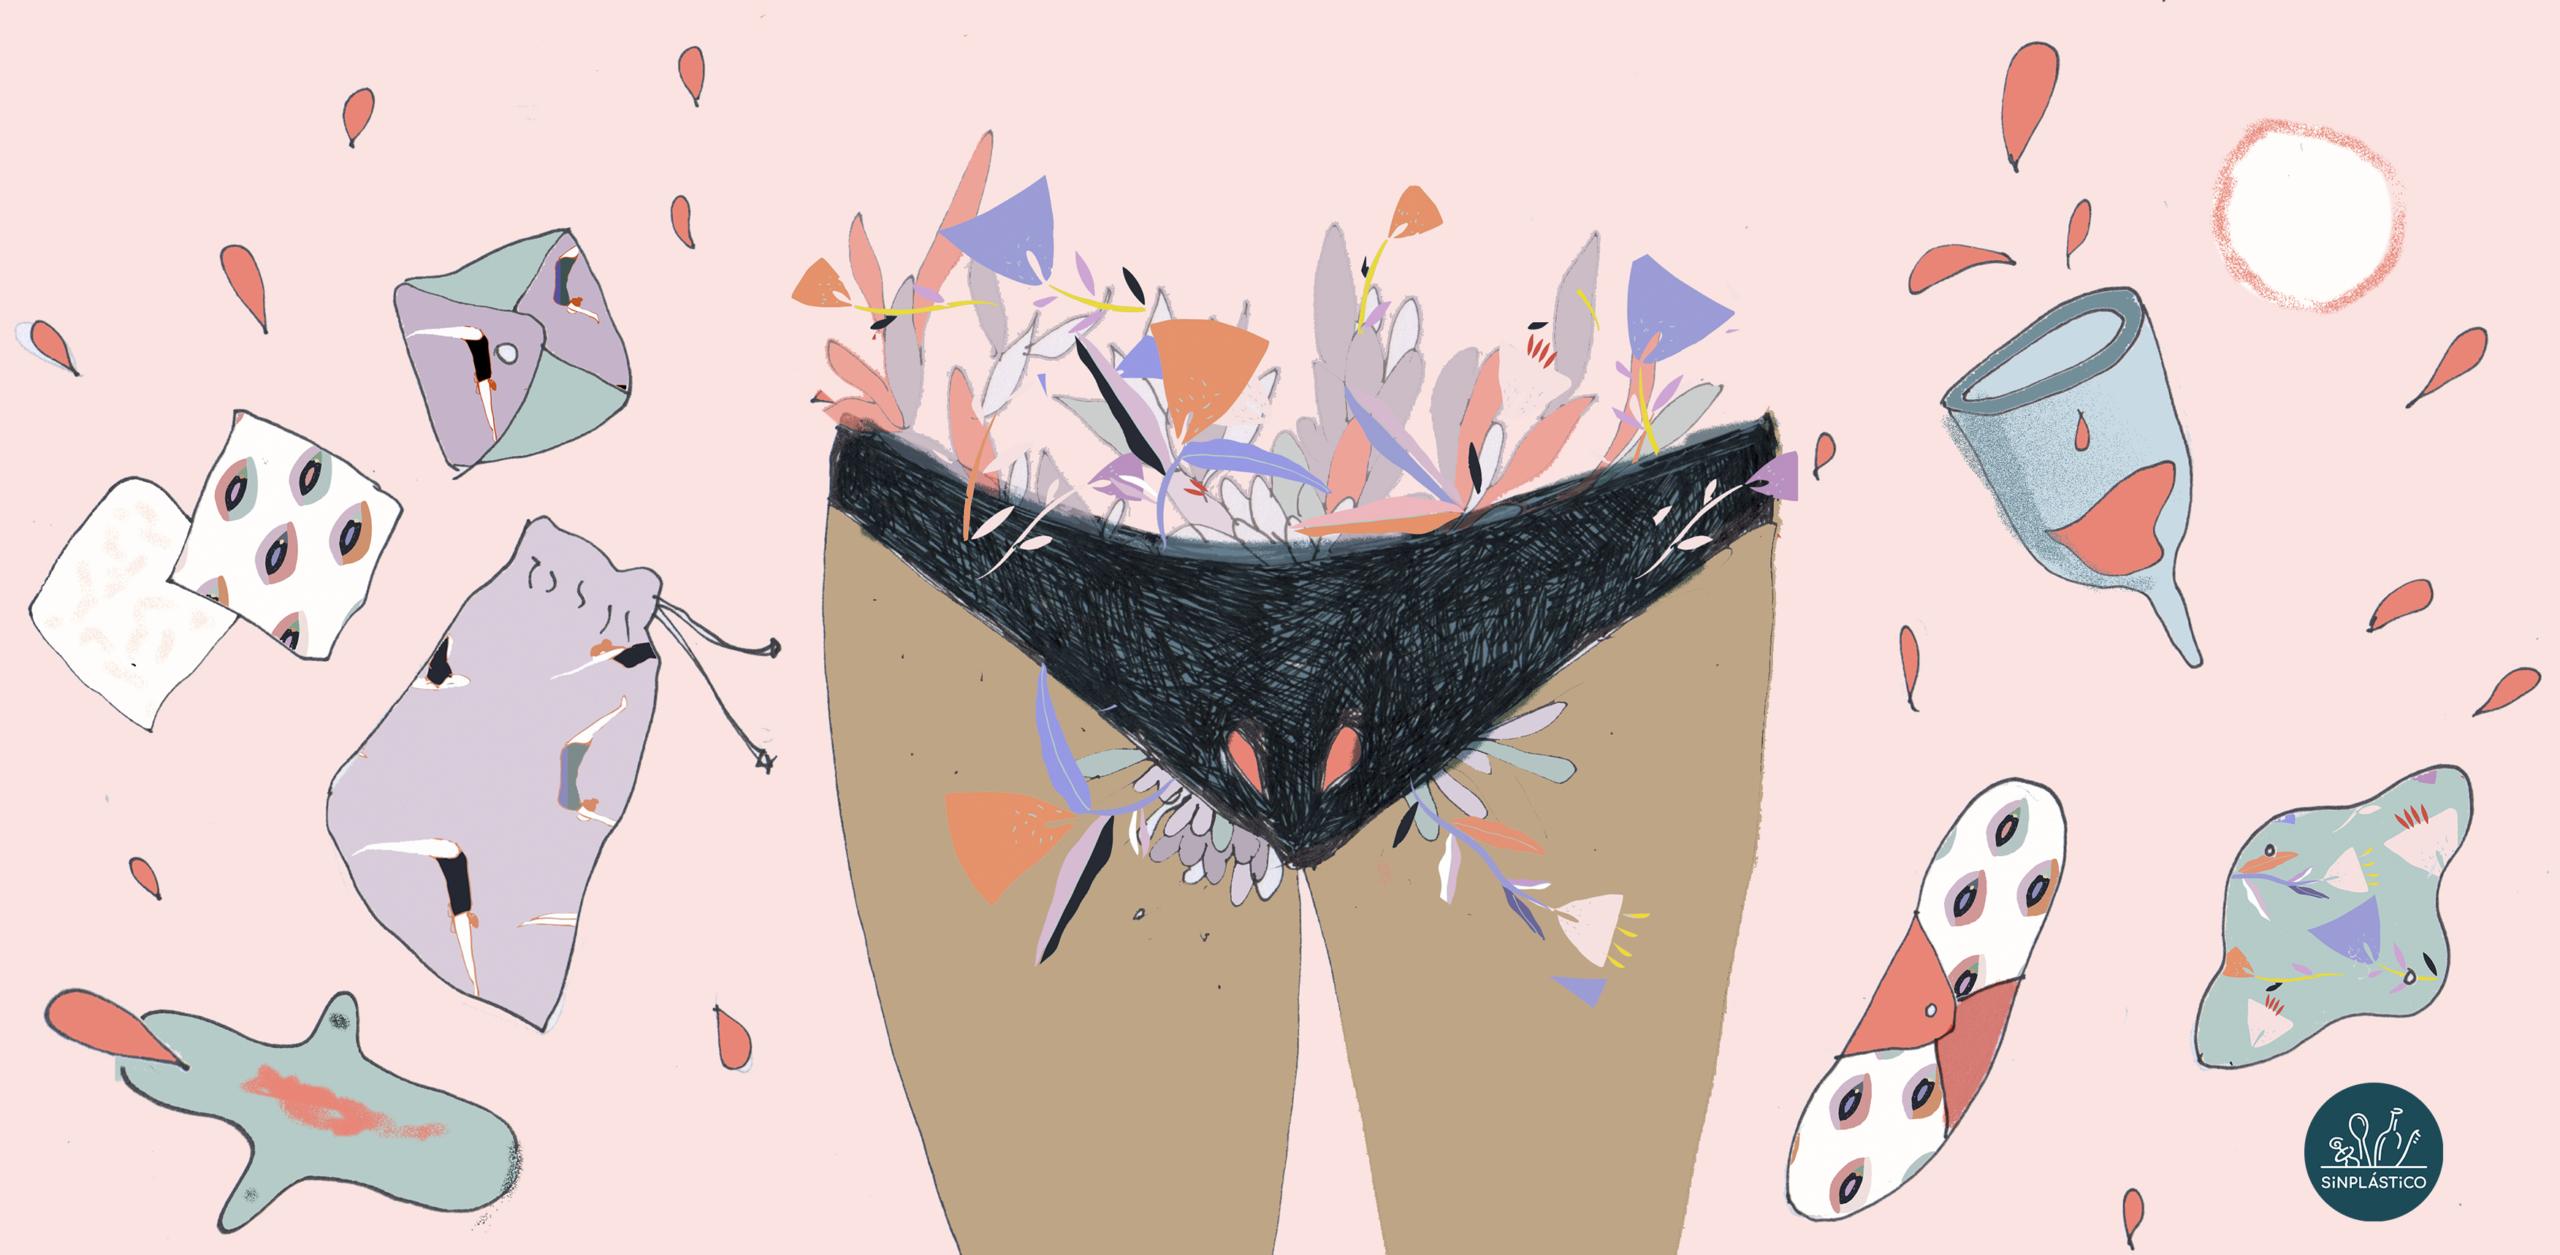 menstraucion sostenible